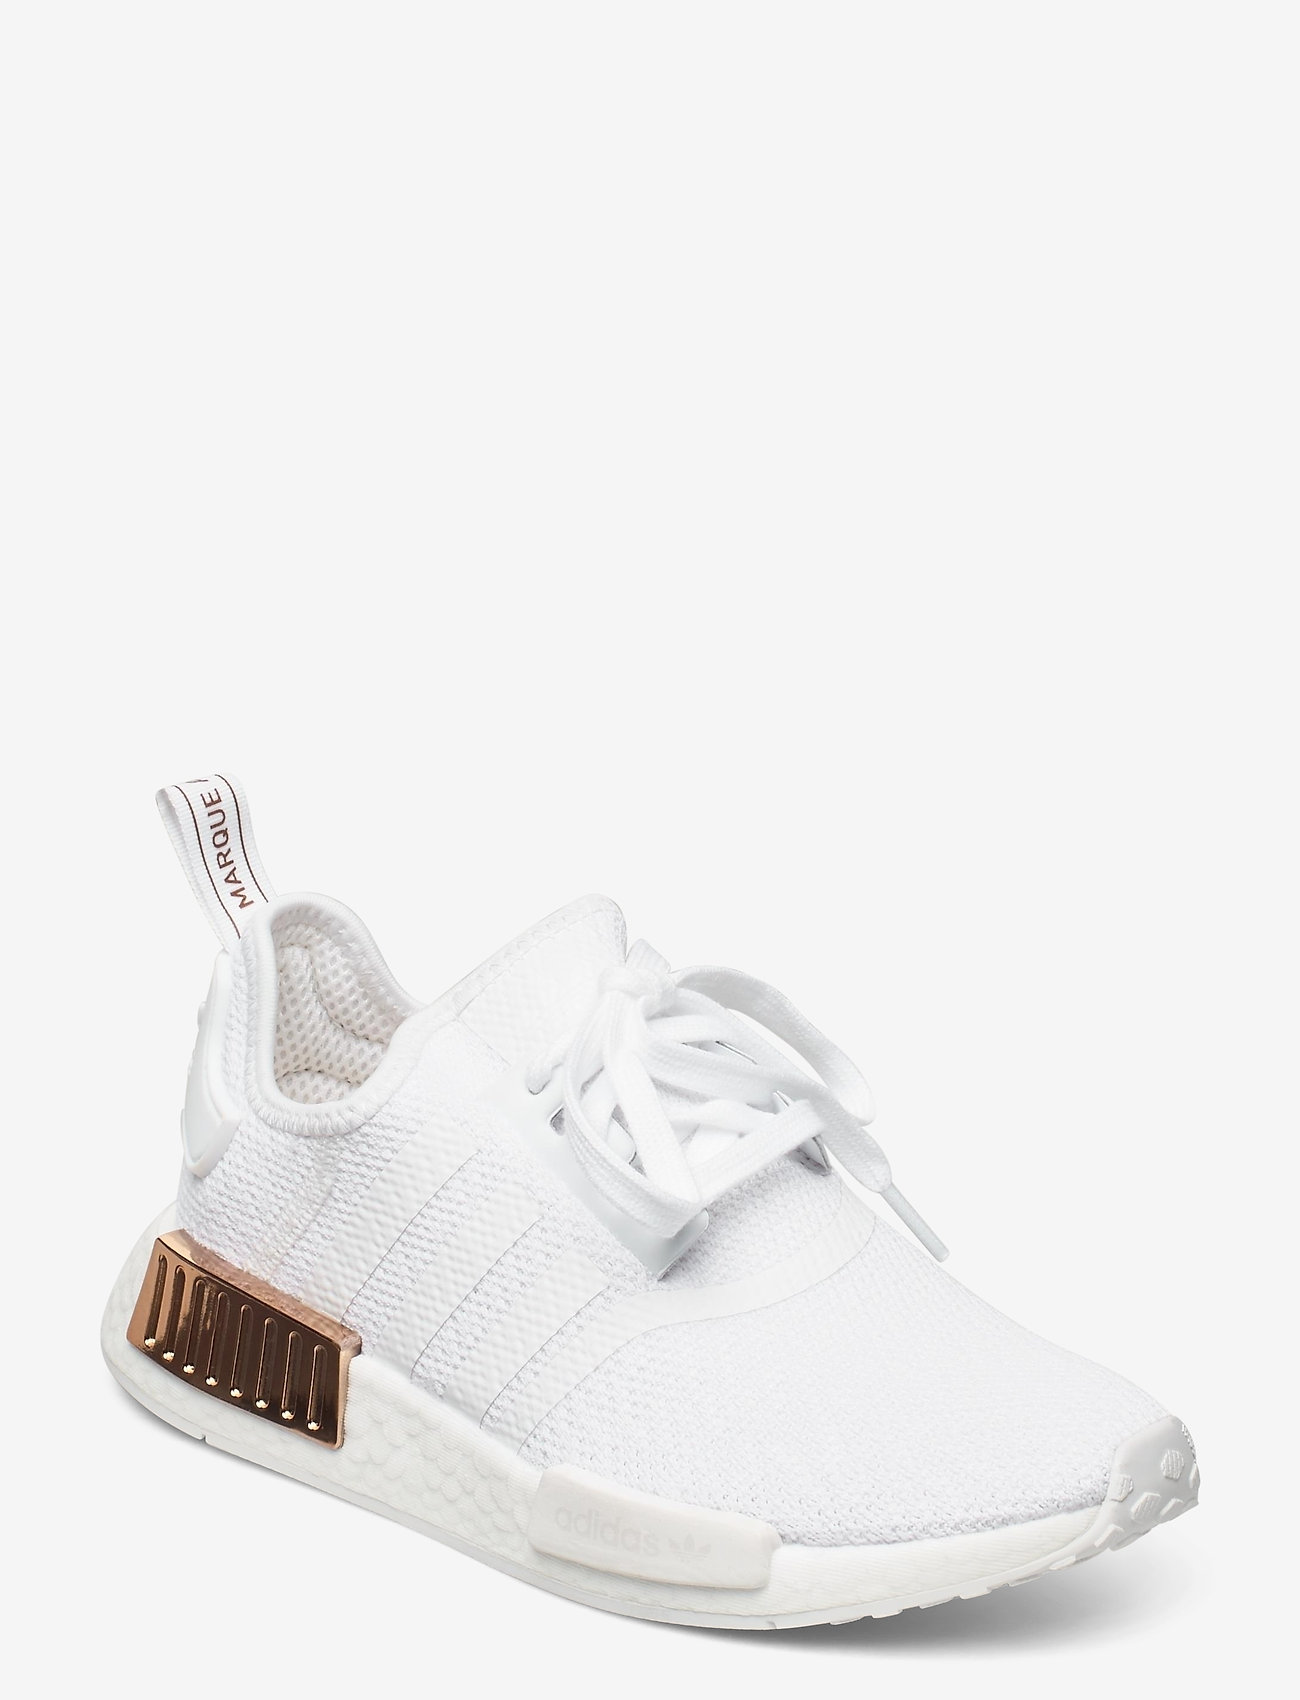 adidas Originals - NMD_R1 W - laag sneakers - ftwwht/ftwwht/coppmt - 0